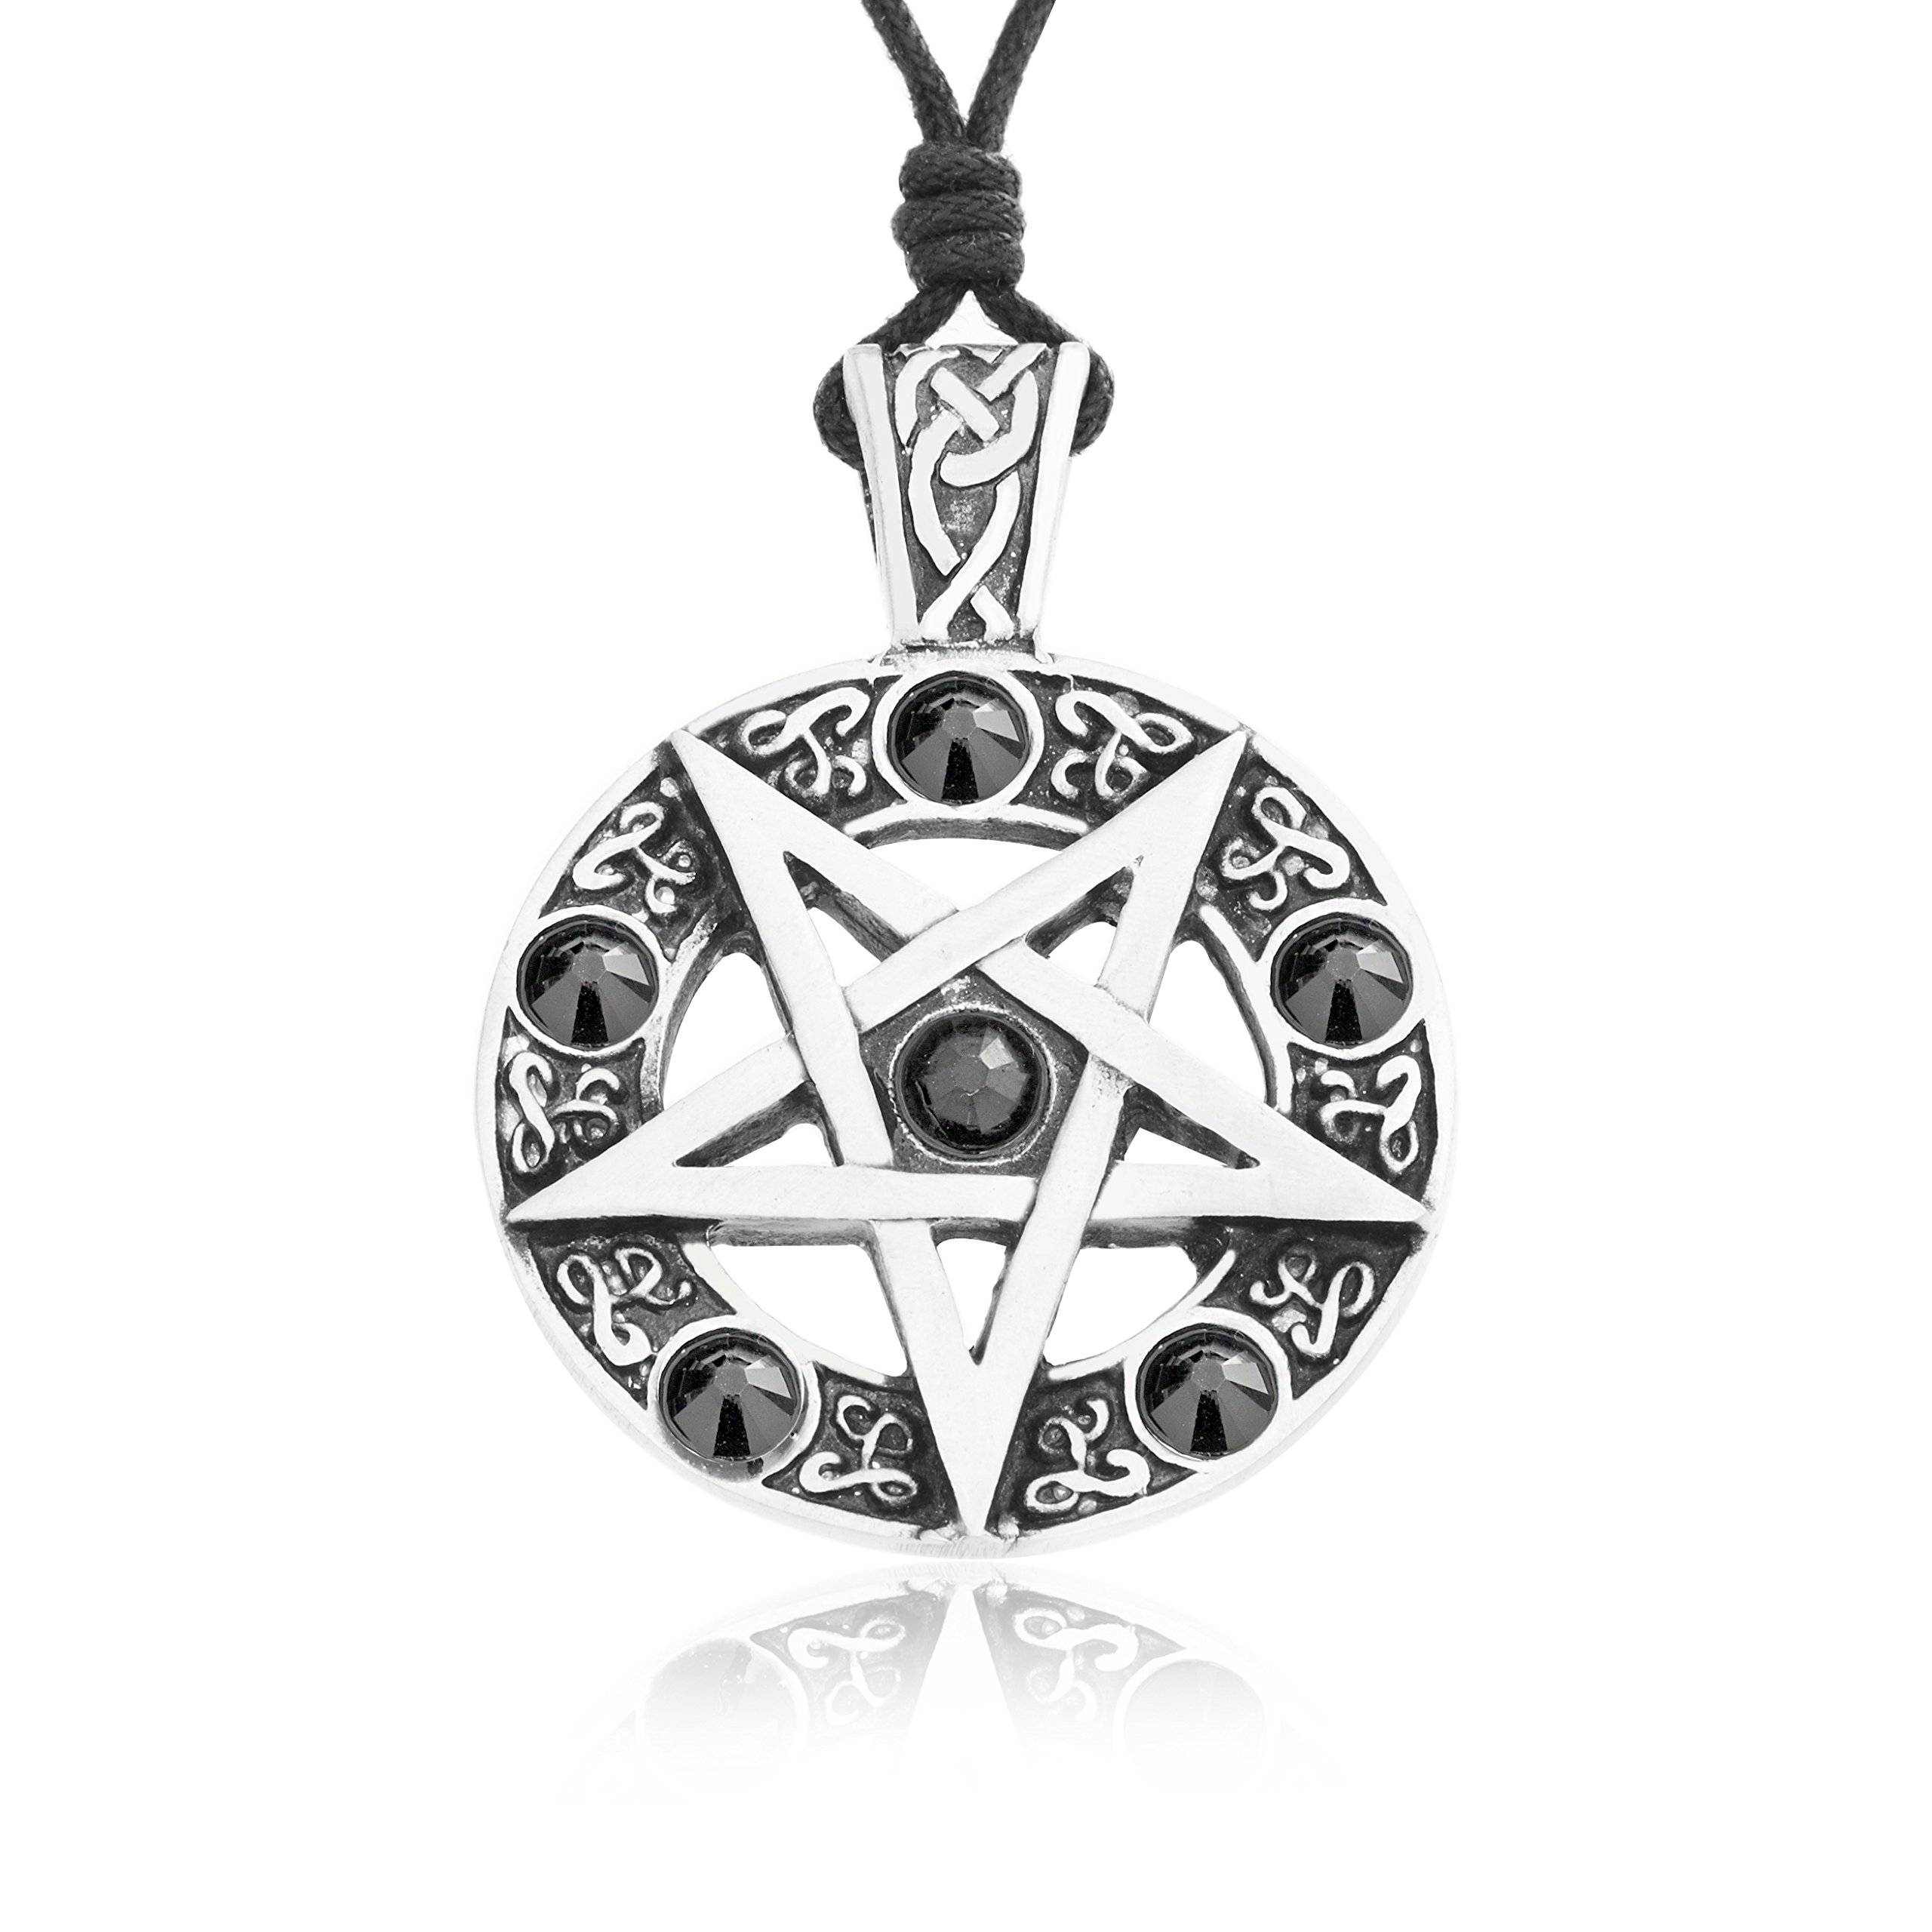 Dan's Jewelers Inverted Pentagram Pentagram Necklace + Silver Plated Clasp, Fine Pewter Jewelry